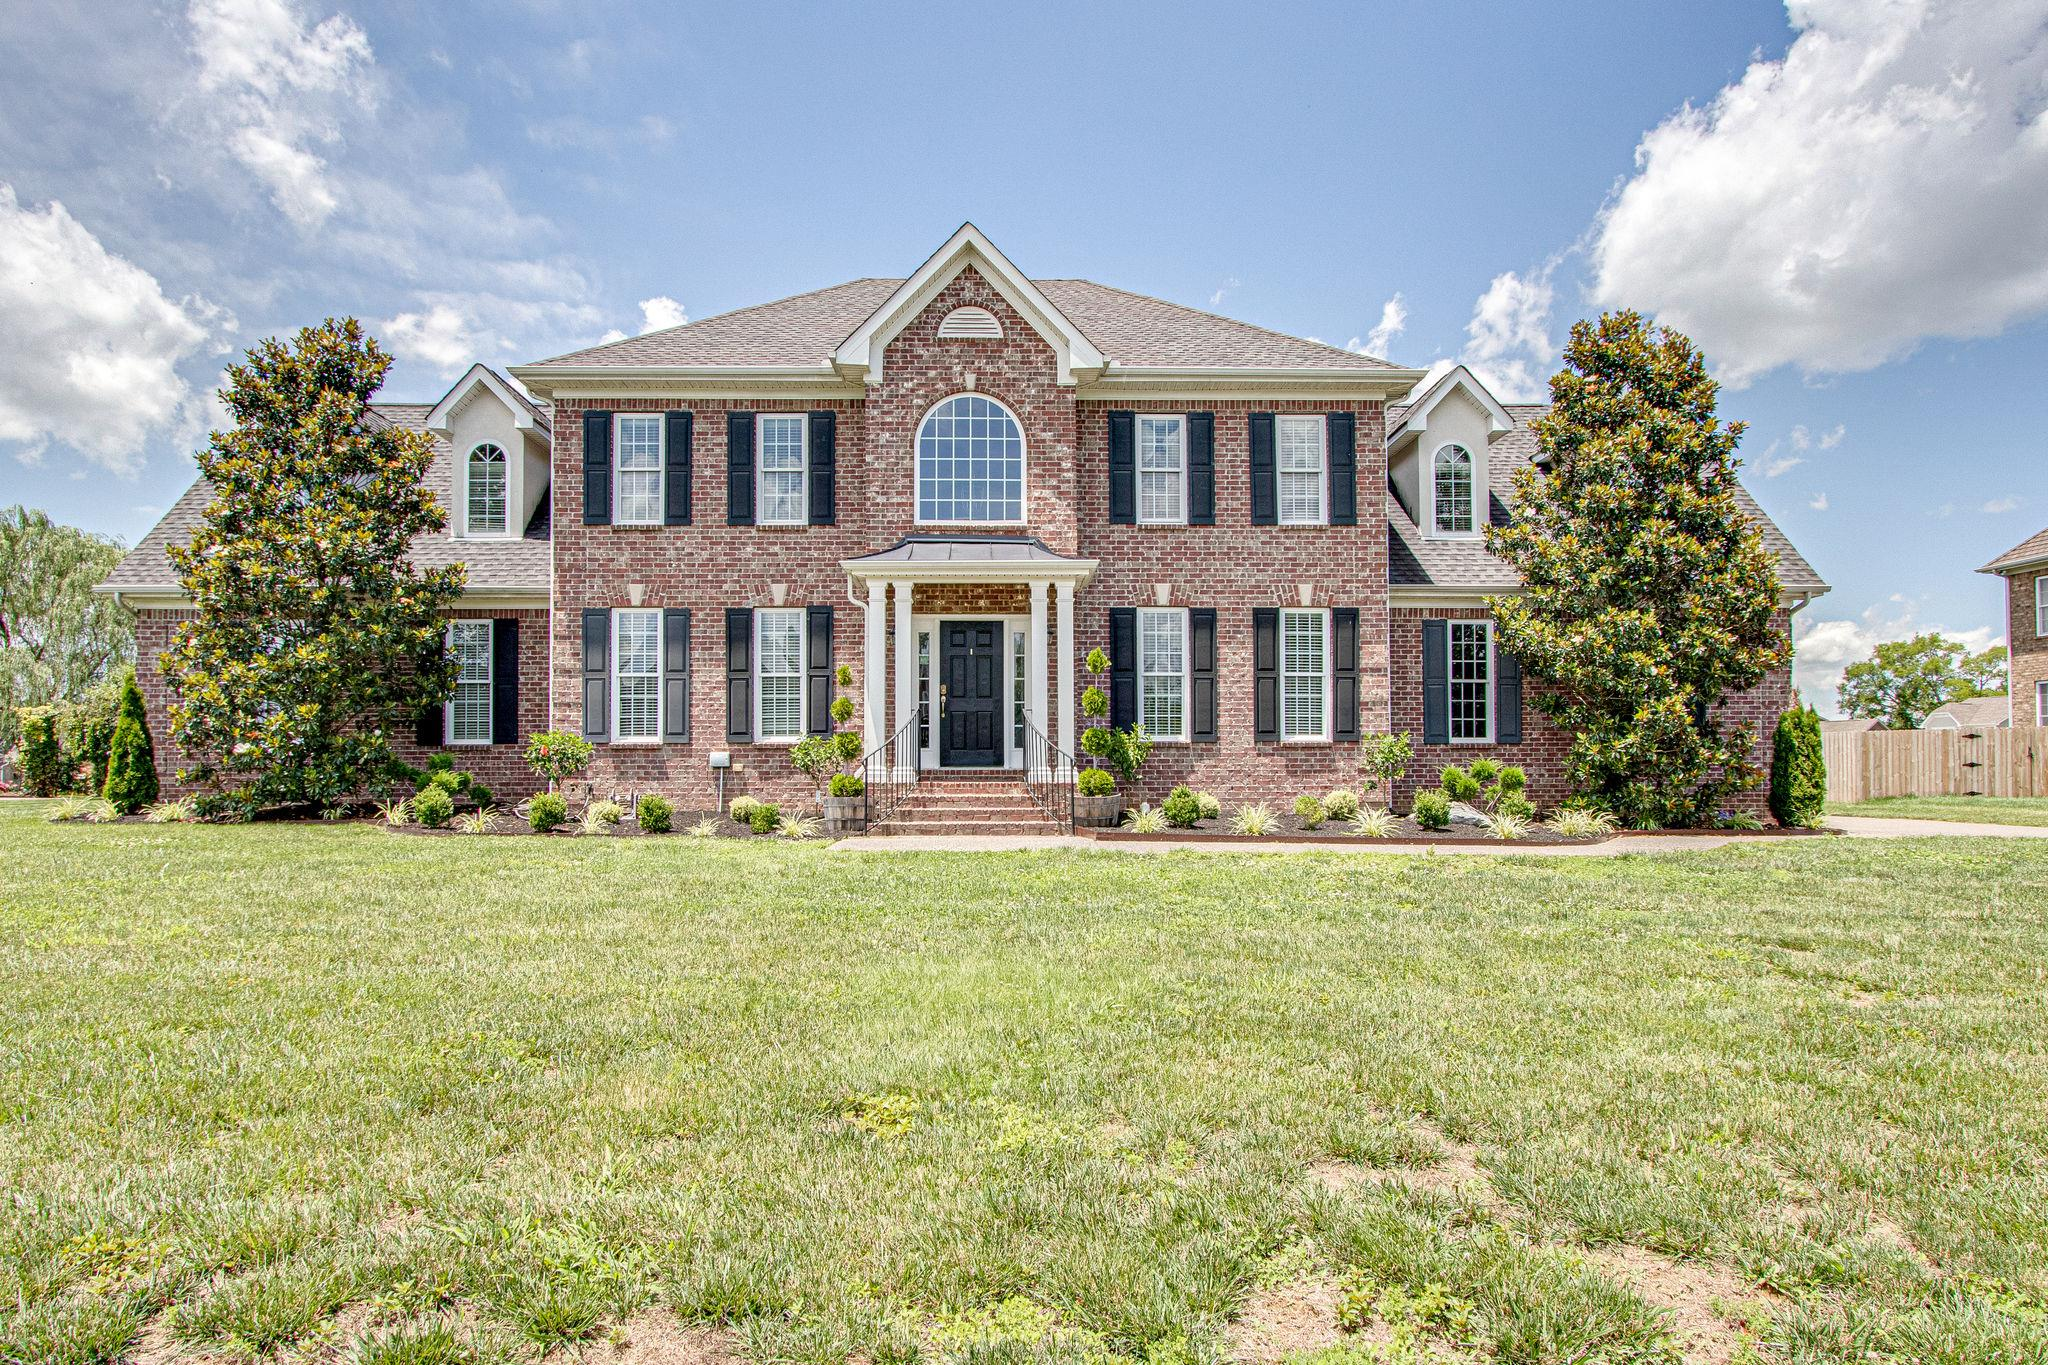 300 Wendling Blvd, Gallatin, TN 37066 - Gallatin, TN real estate listing